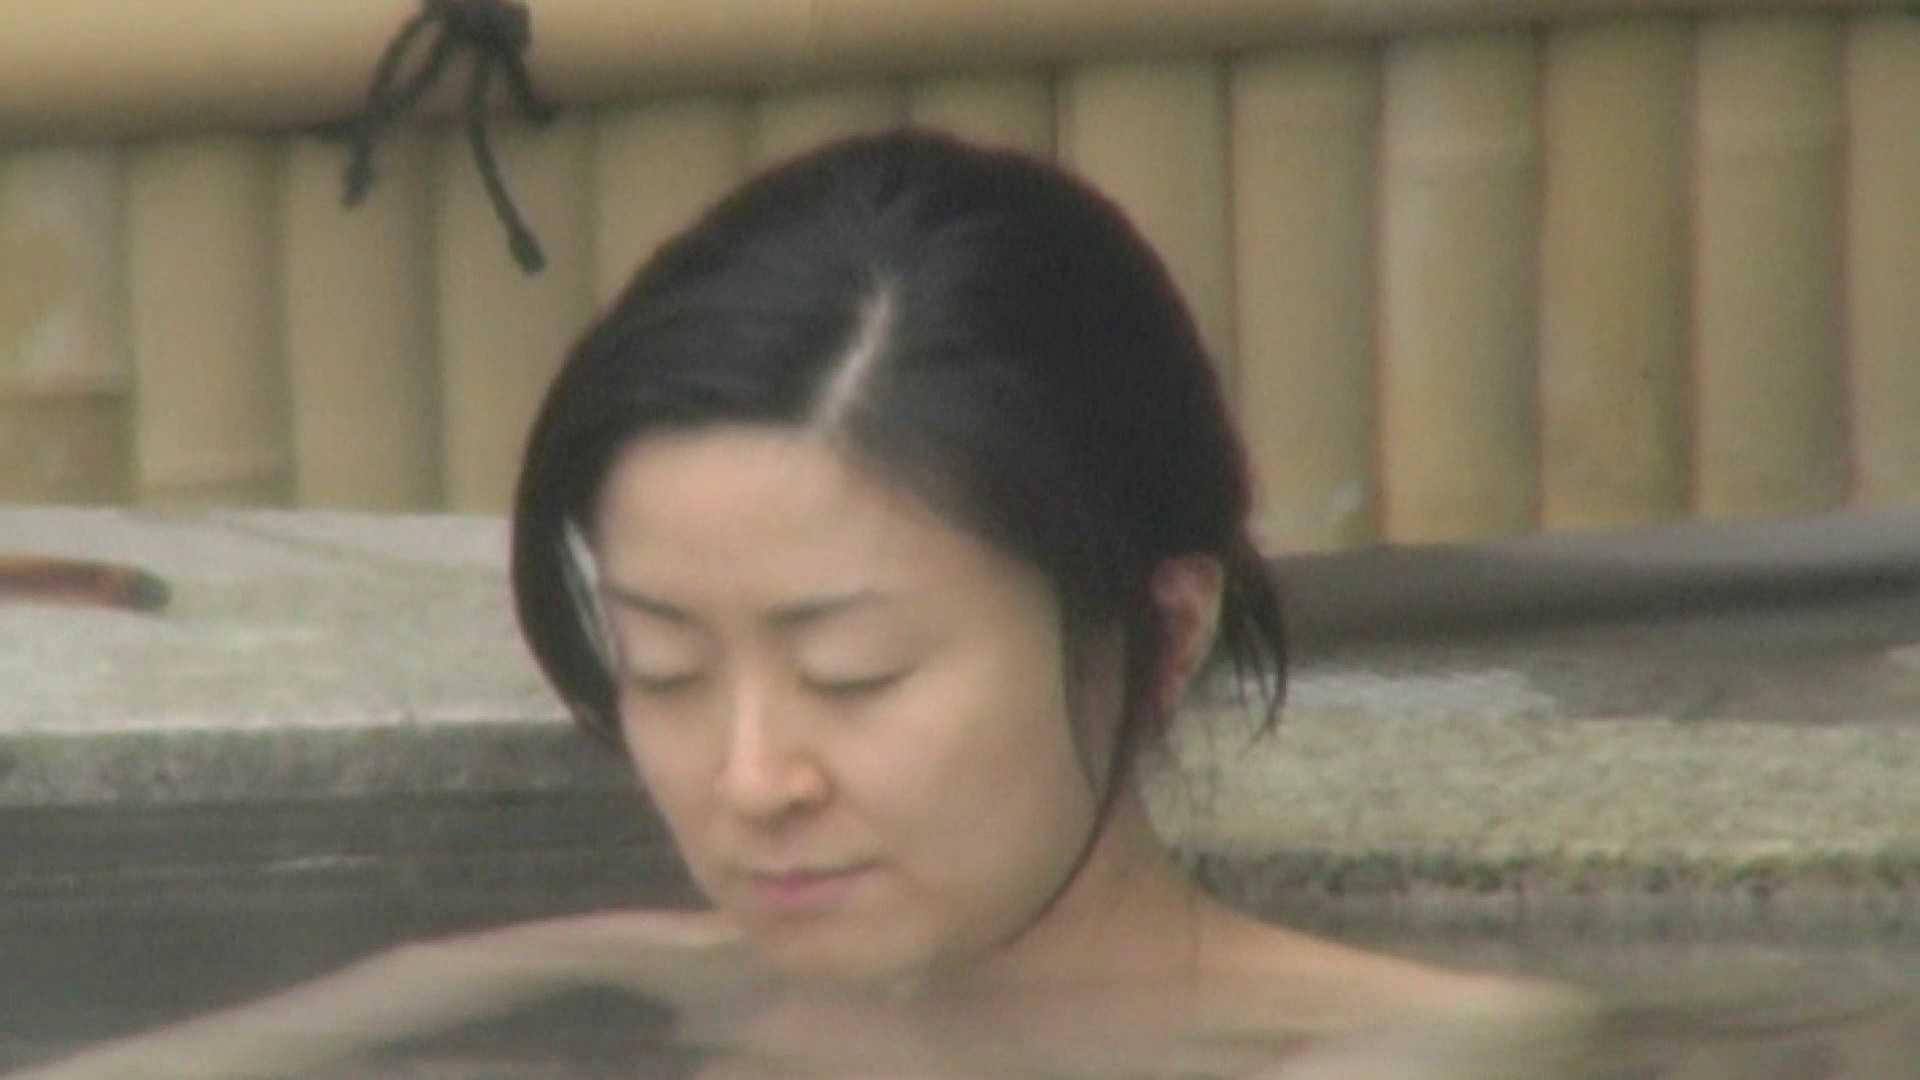 Aquaな露天風呂Vol.548 盗撮  97連発 38